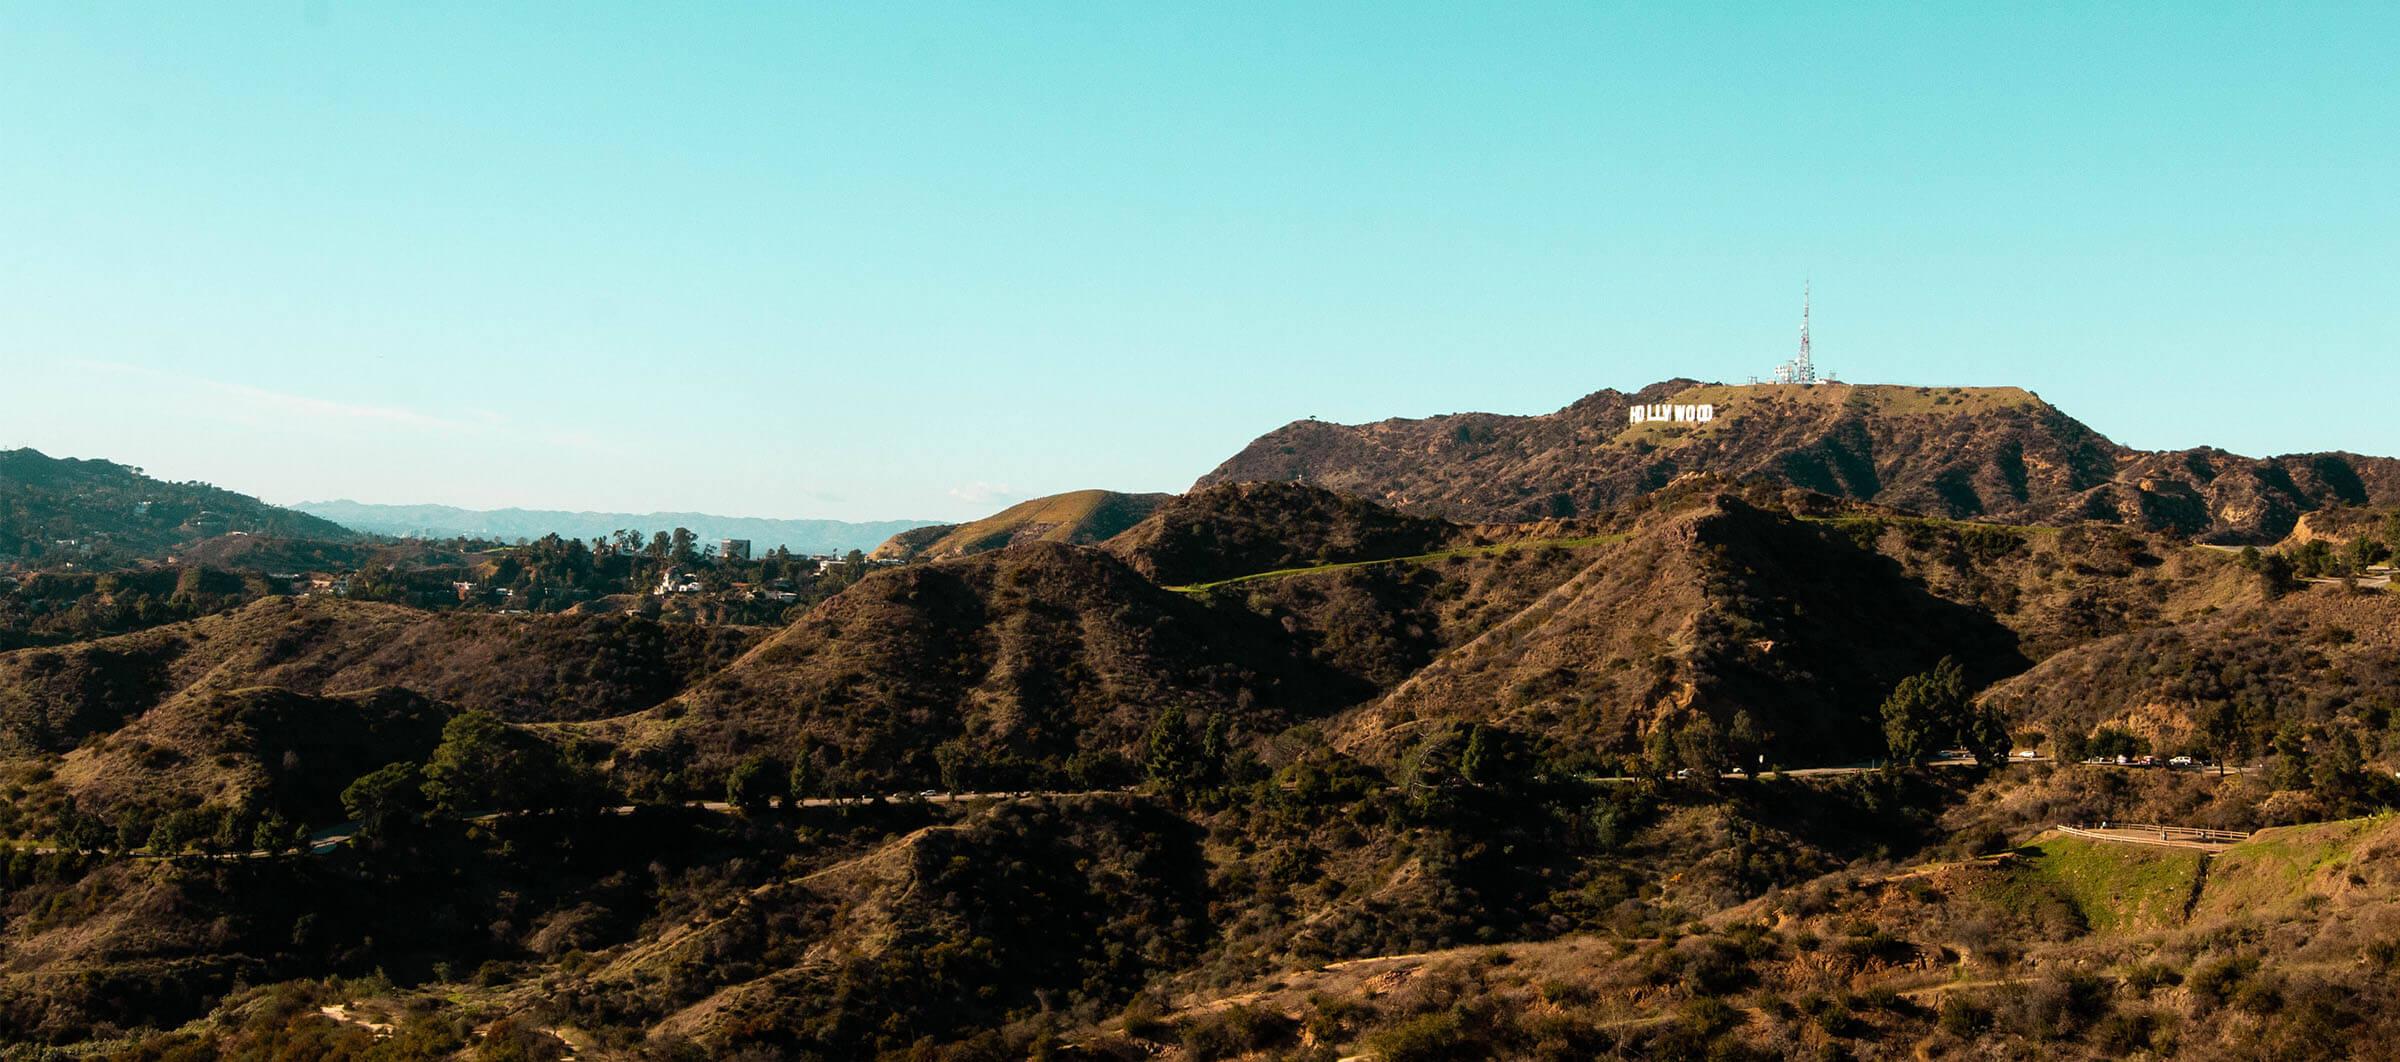 APPA-Real-Estate-Developer-West-Coast